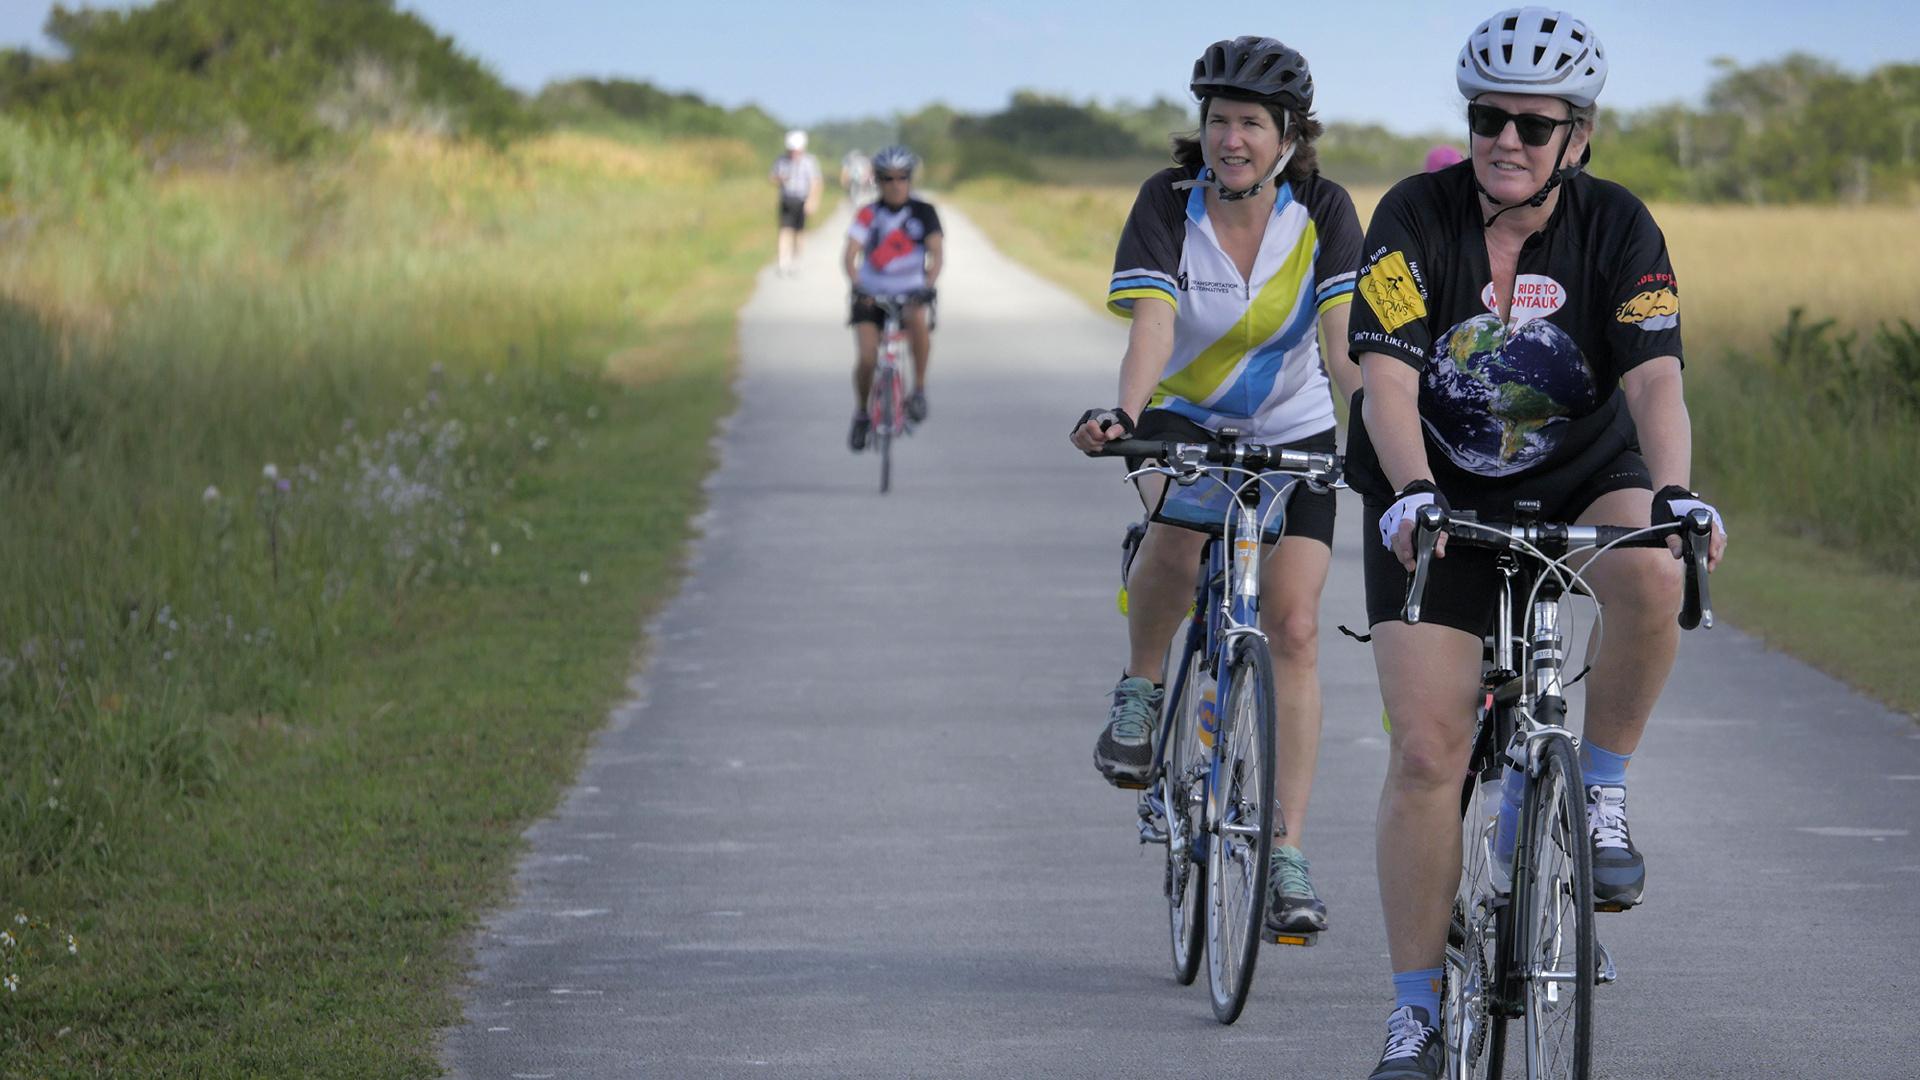 Cyclists ride the bike path to the Florida Keys